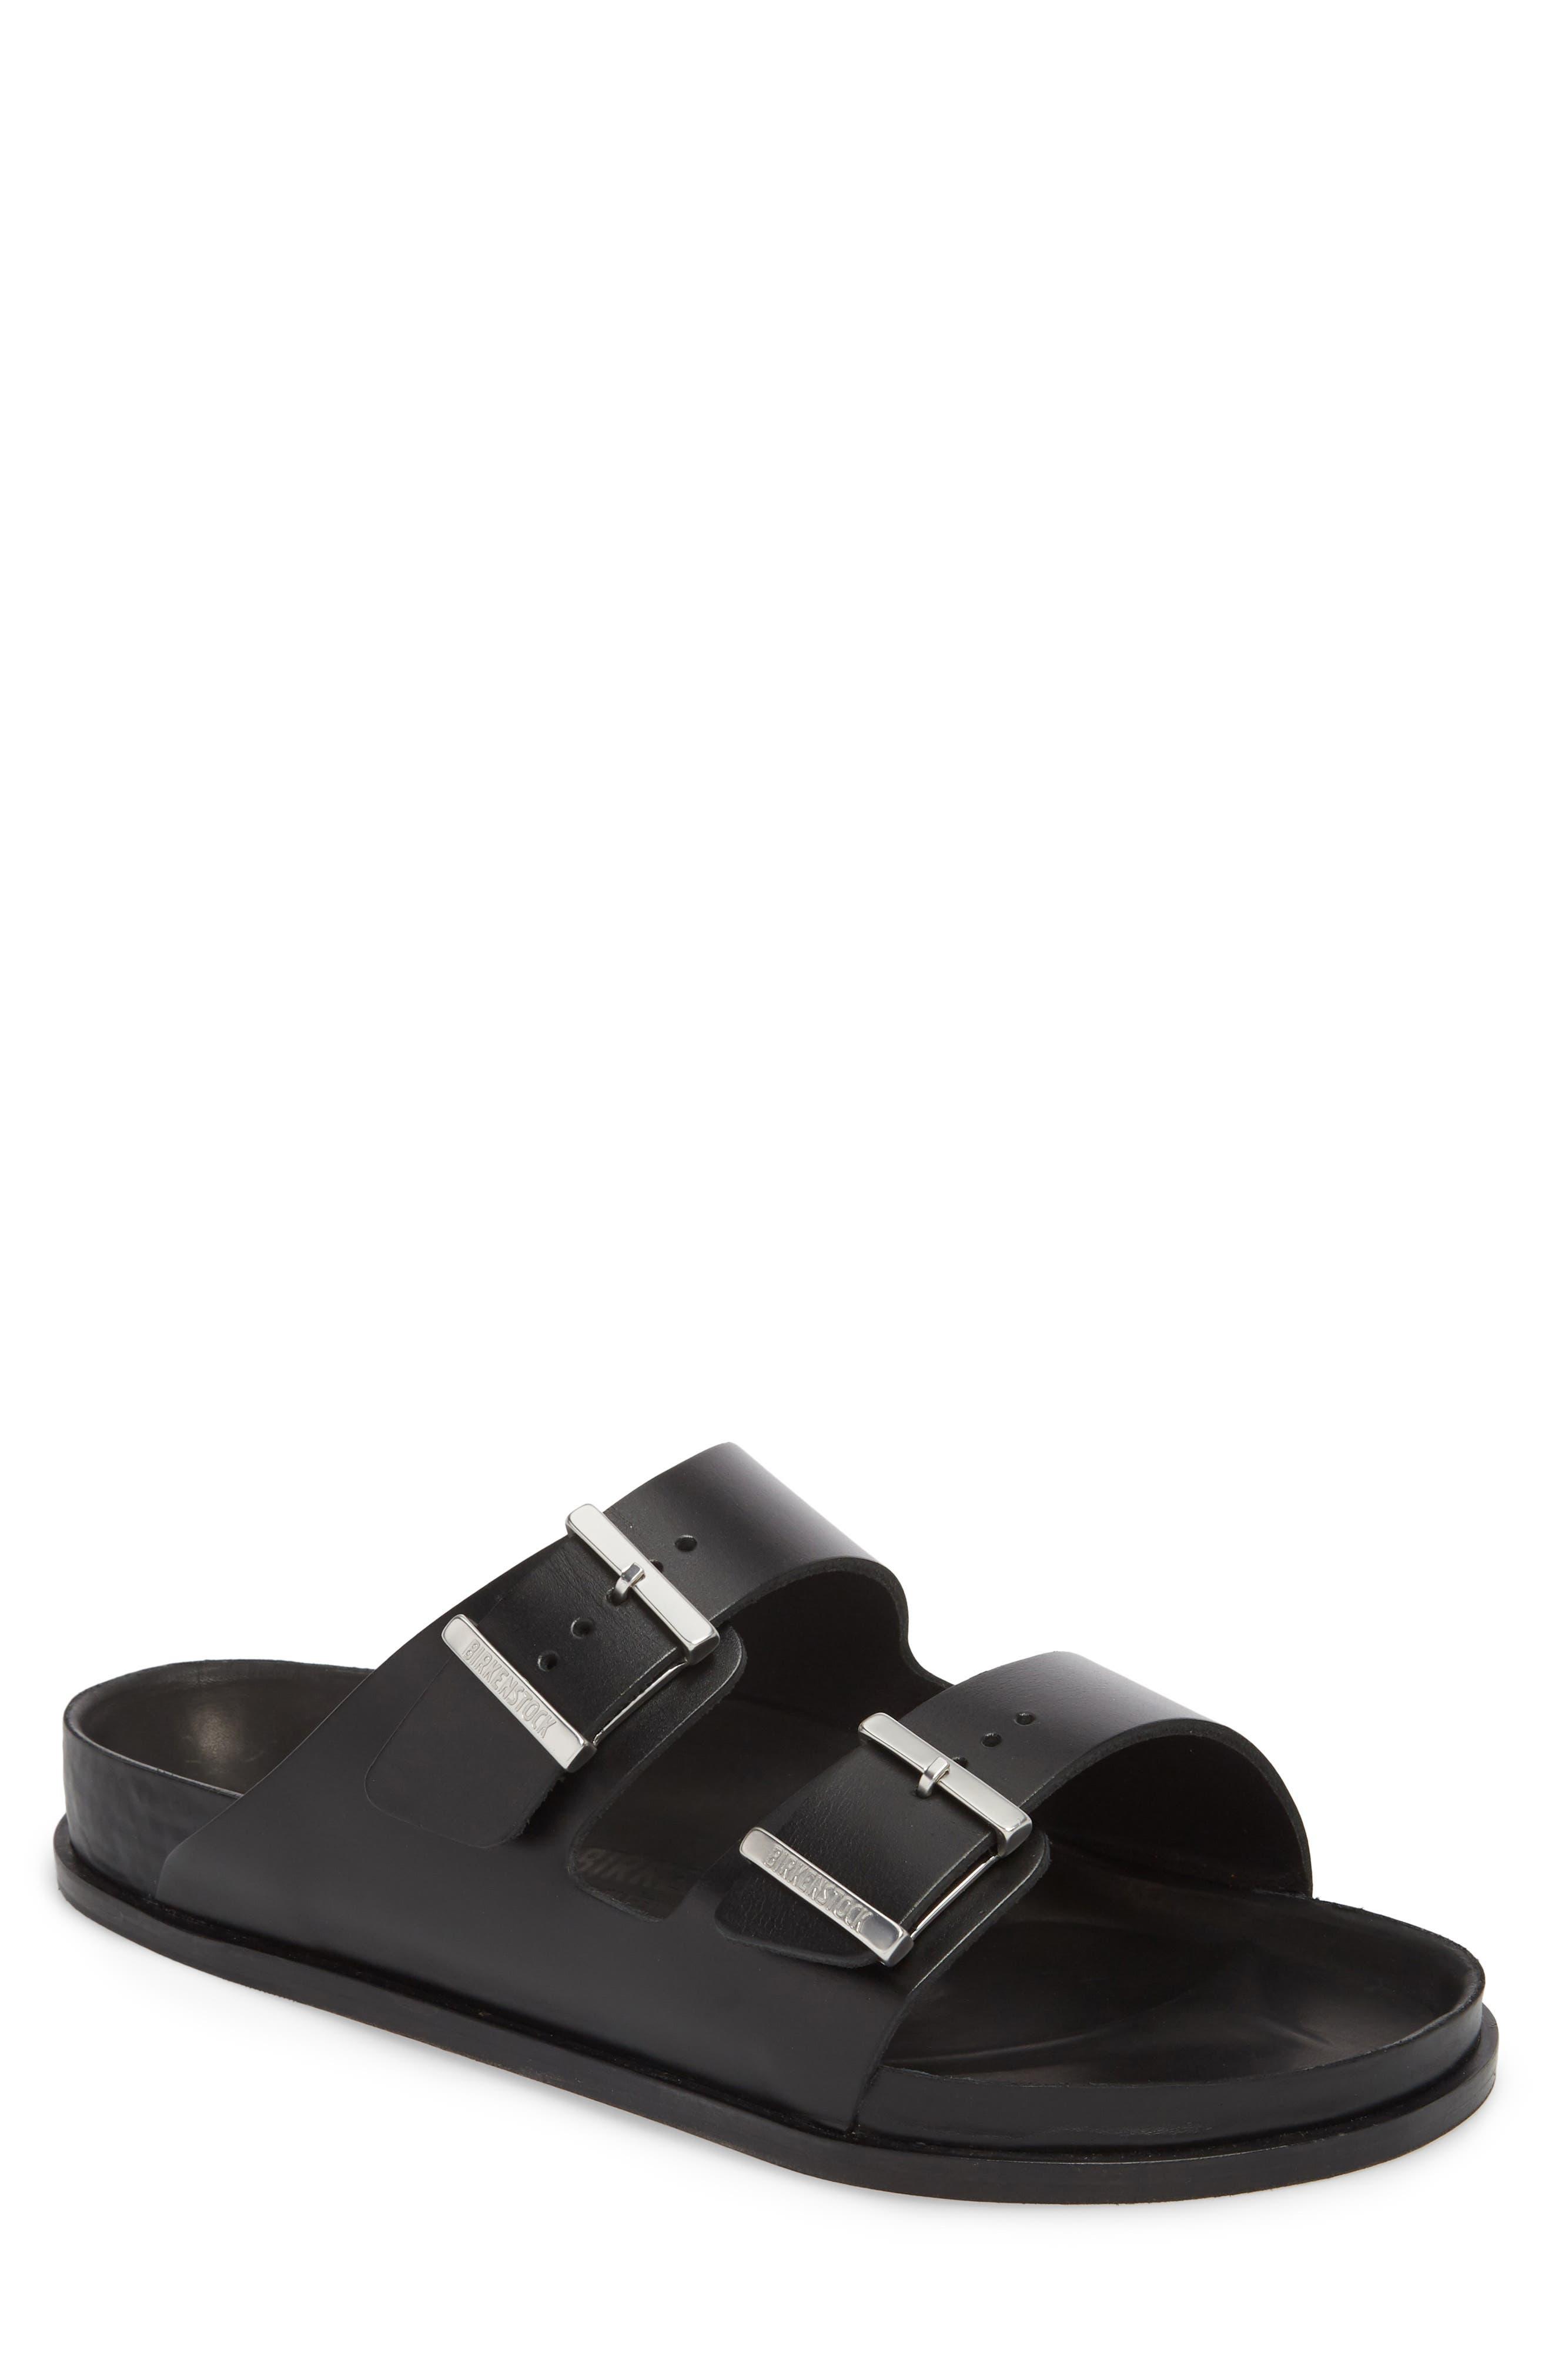 Birkenstock Arizona Premium Slide Sandal